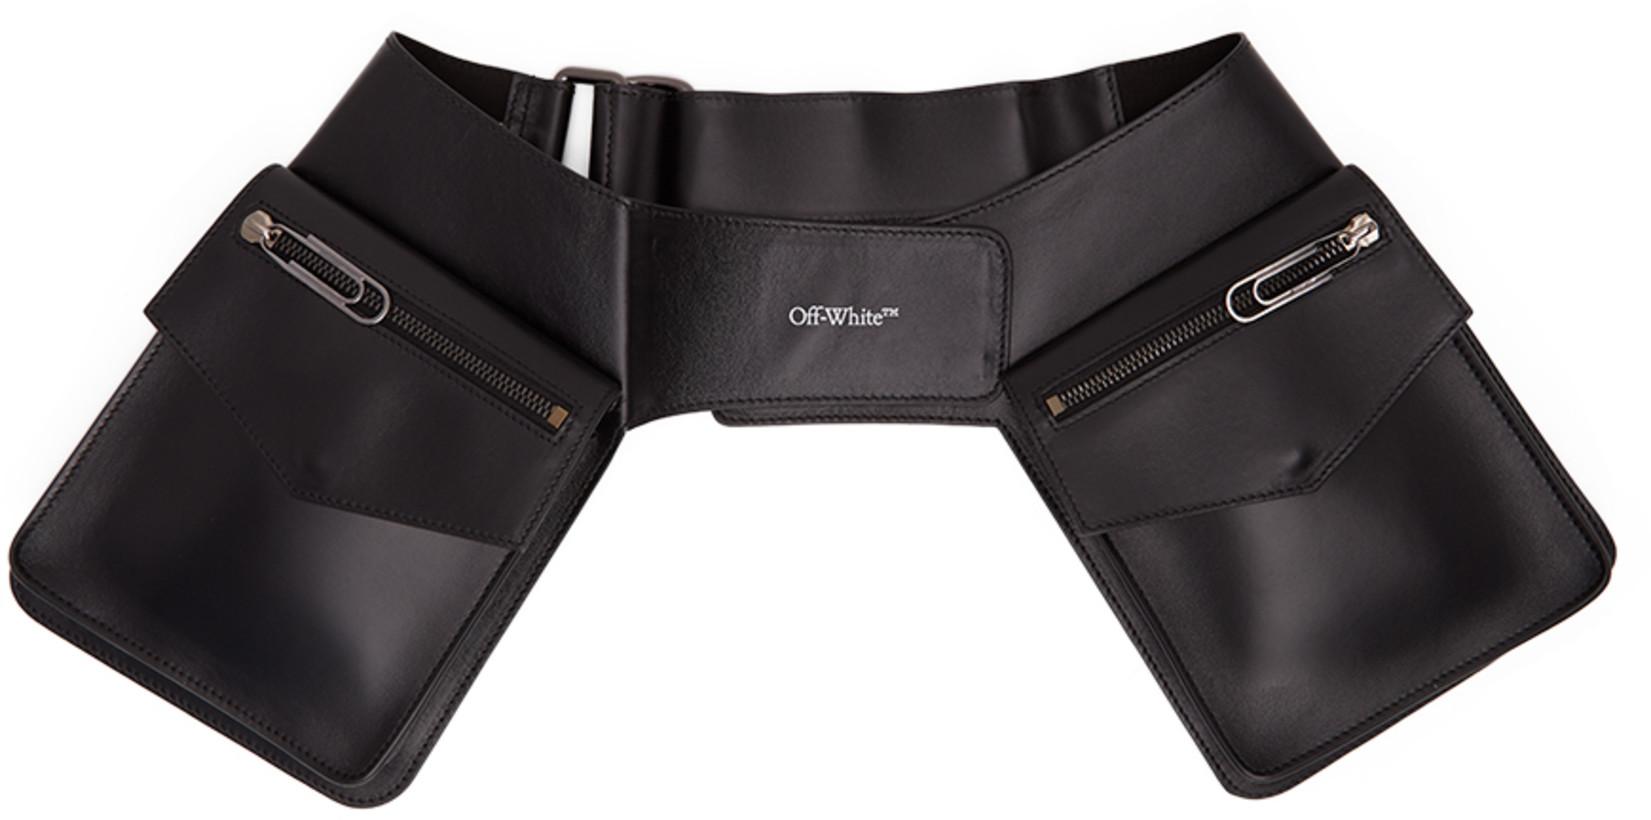 Off-White Black Pouch Belt Bag